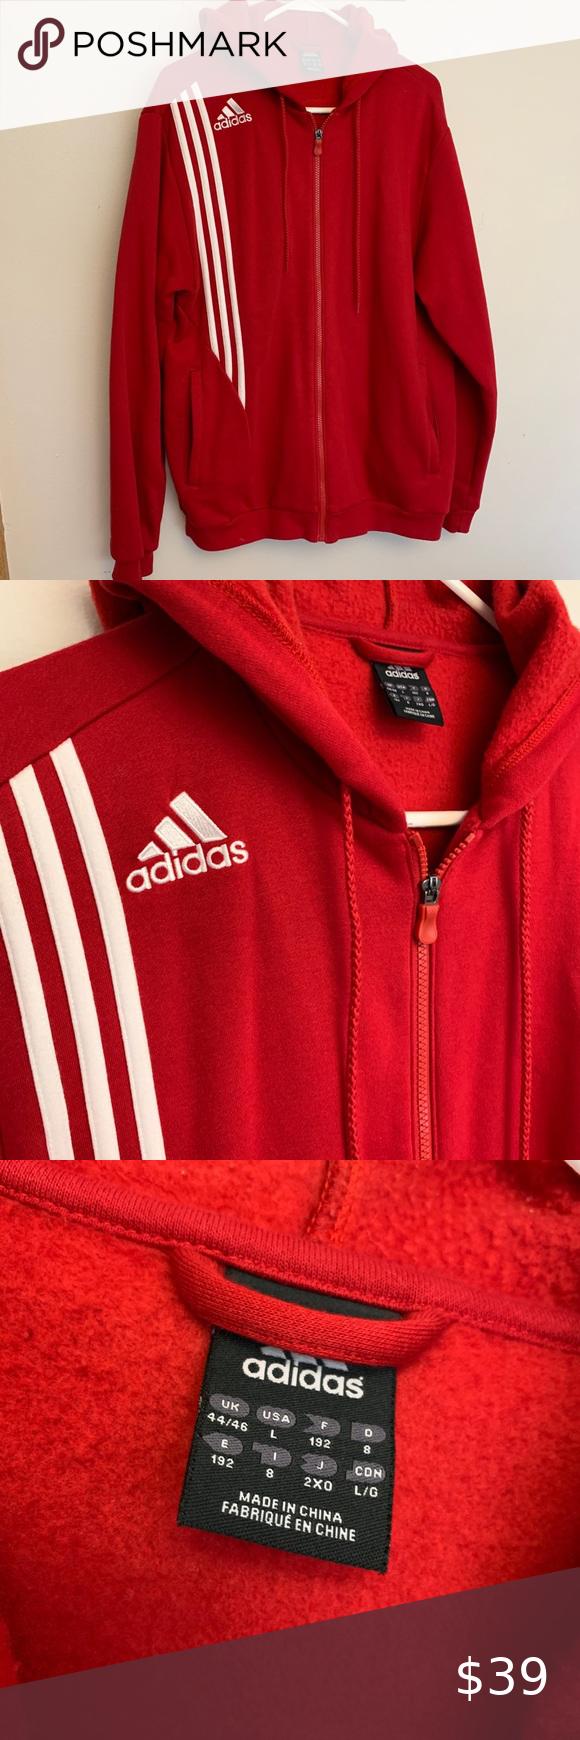 Adidas Hoodie Red Zip Up Size Men S Large Adidas Hoodie Red Zip Ups Red Hoodie [ 1740 x 580 Pixel ]